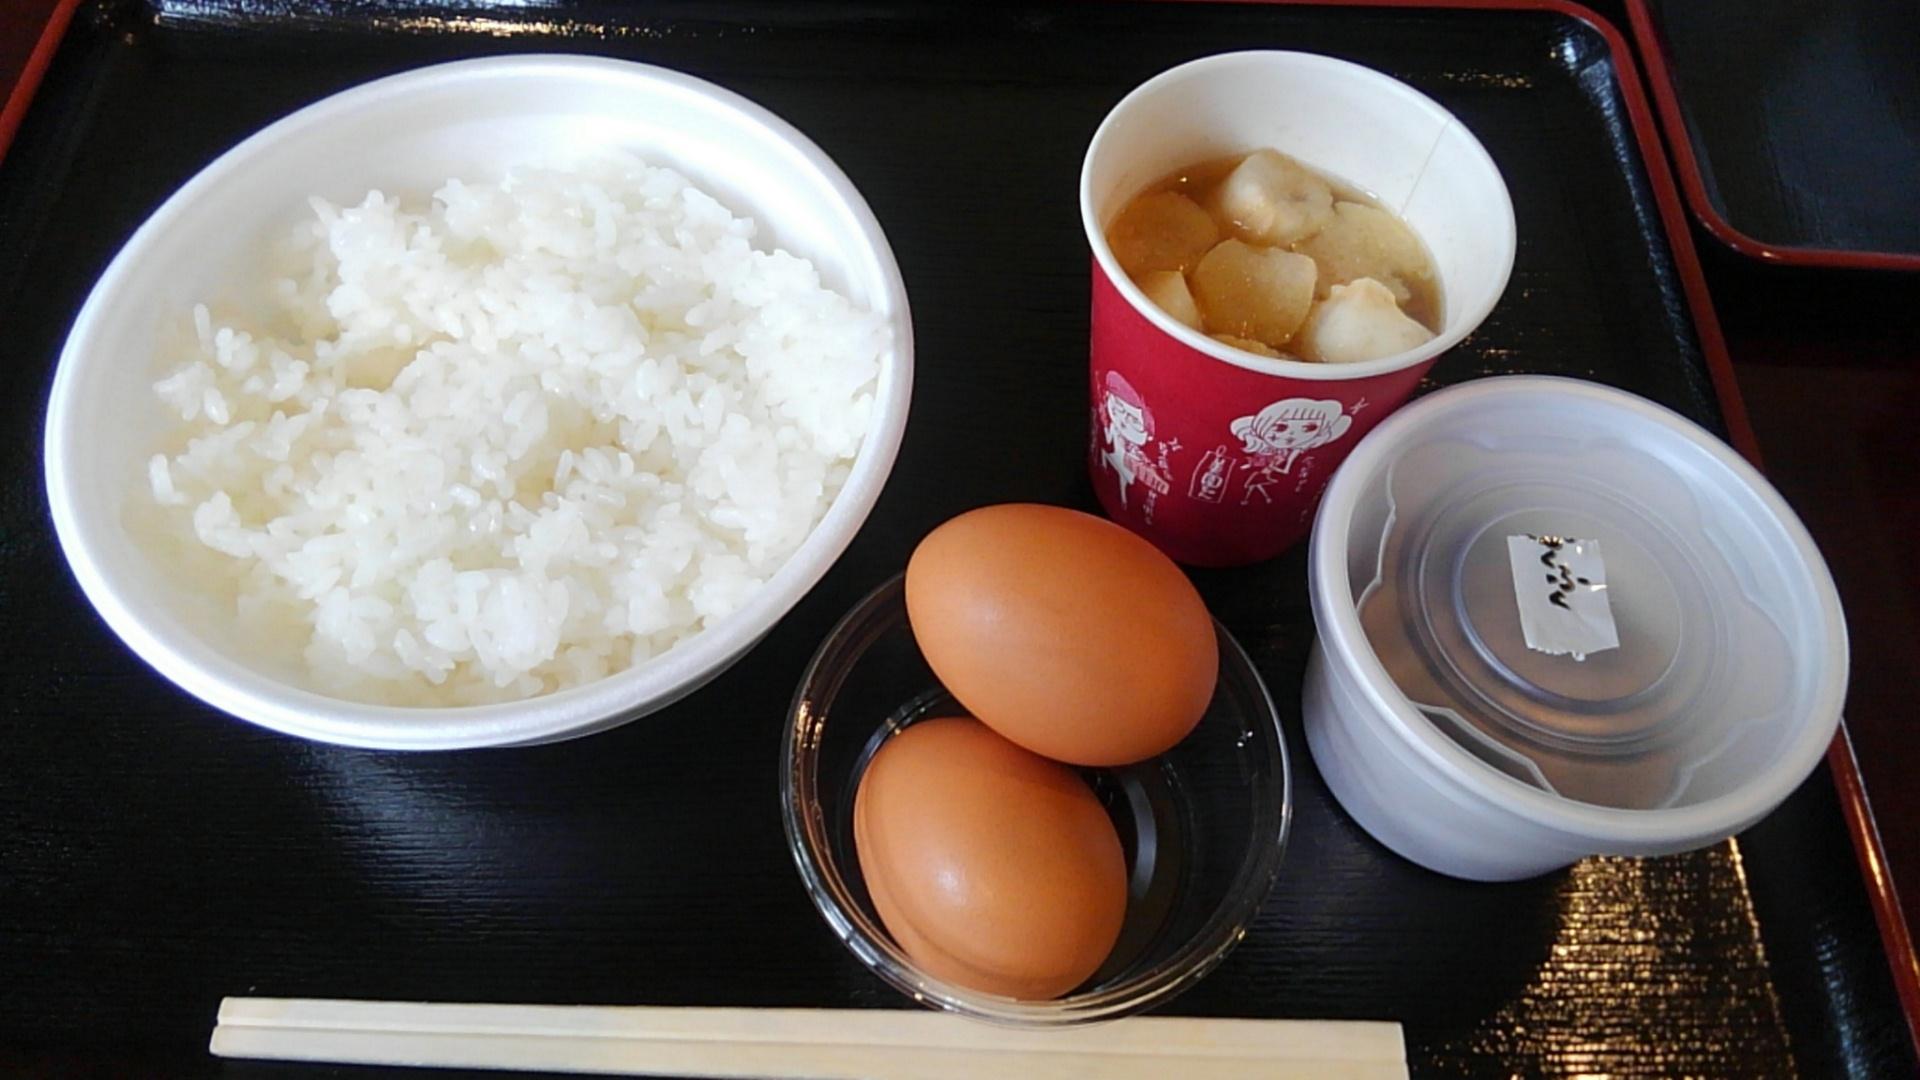 株式会社フクダ 那須直営店 name=